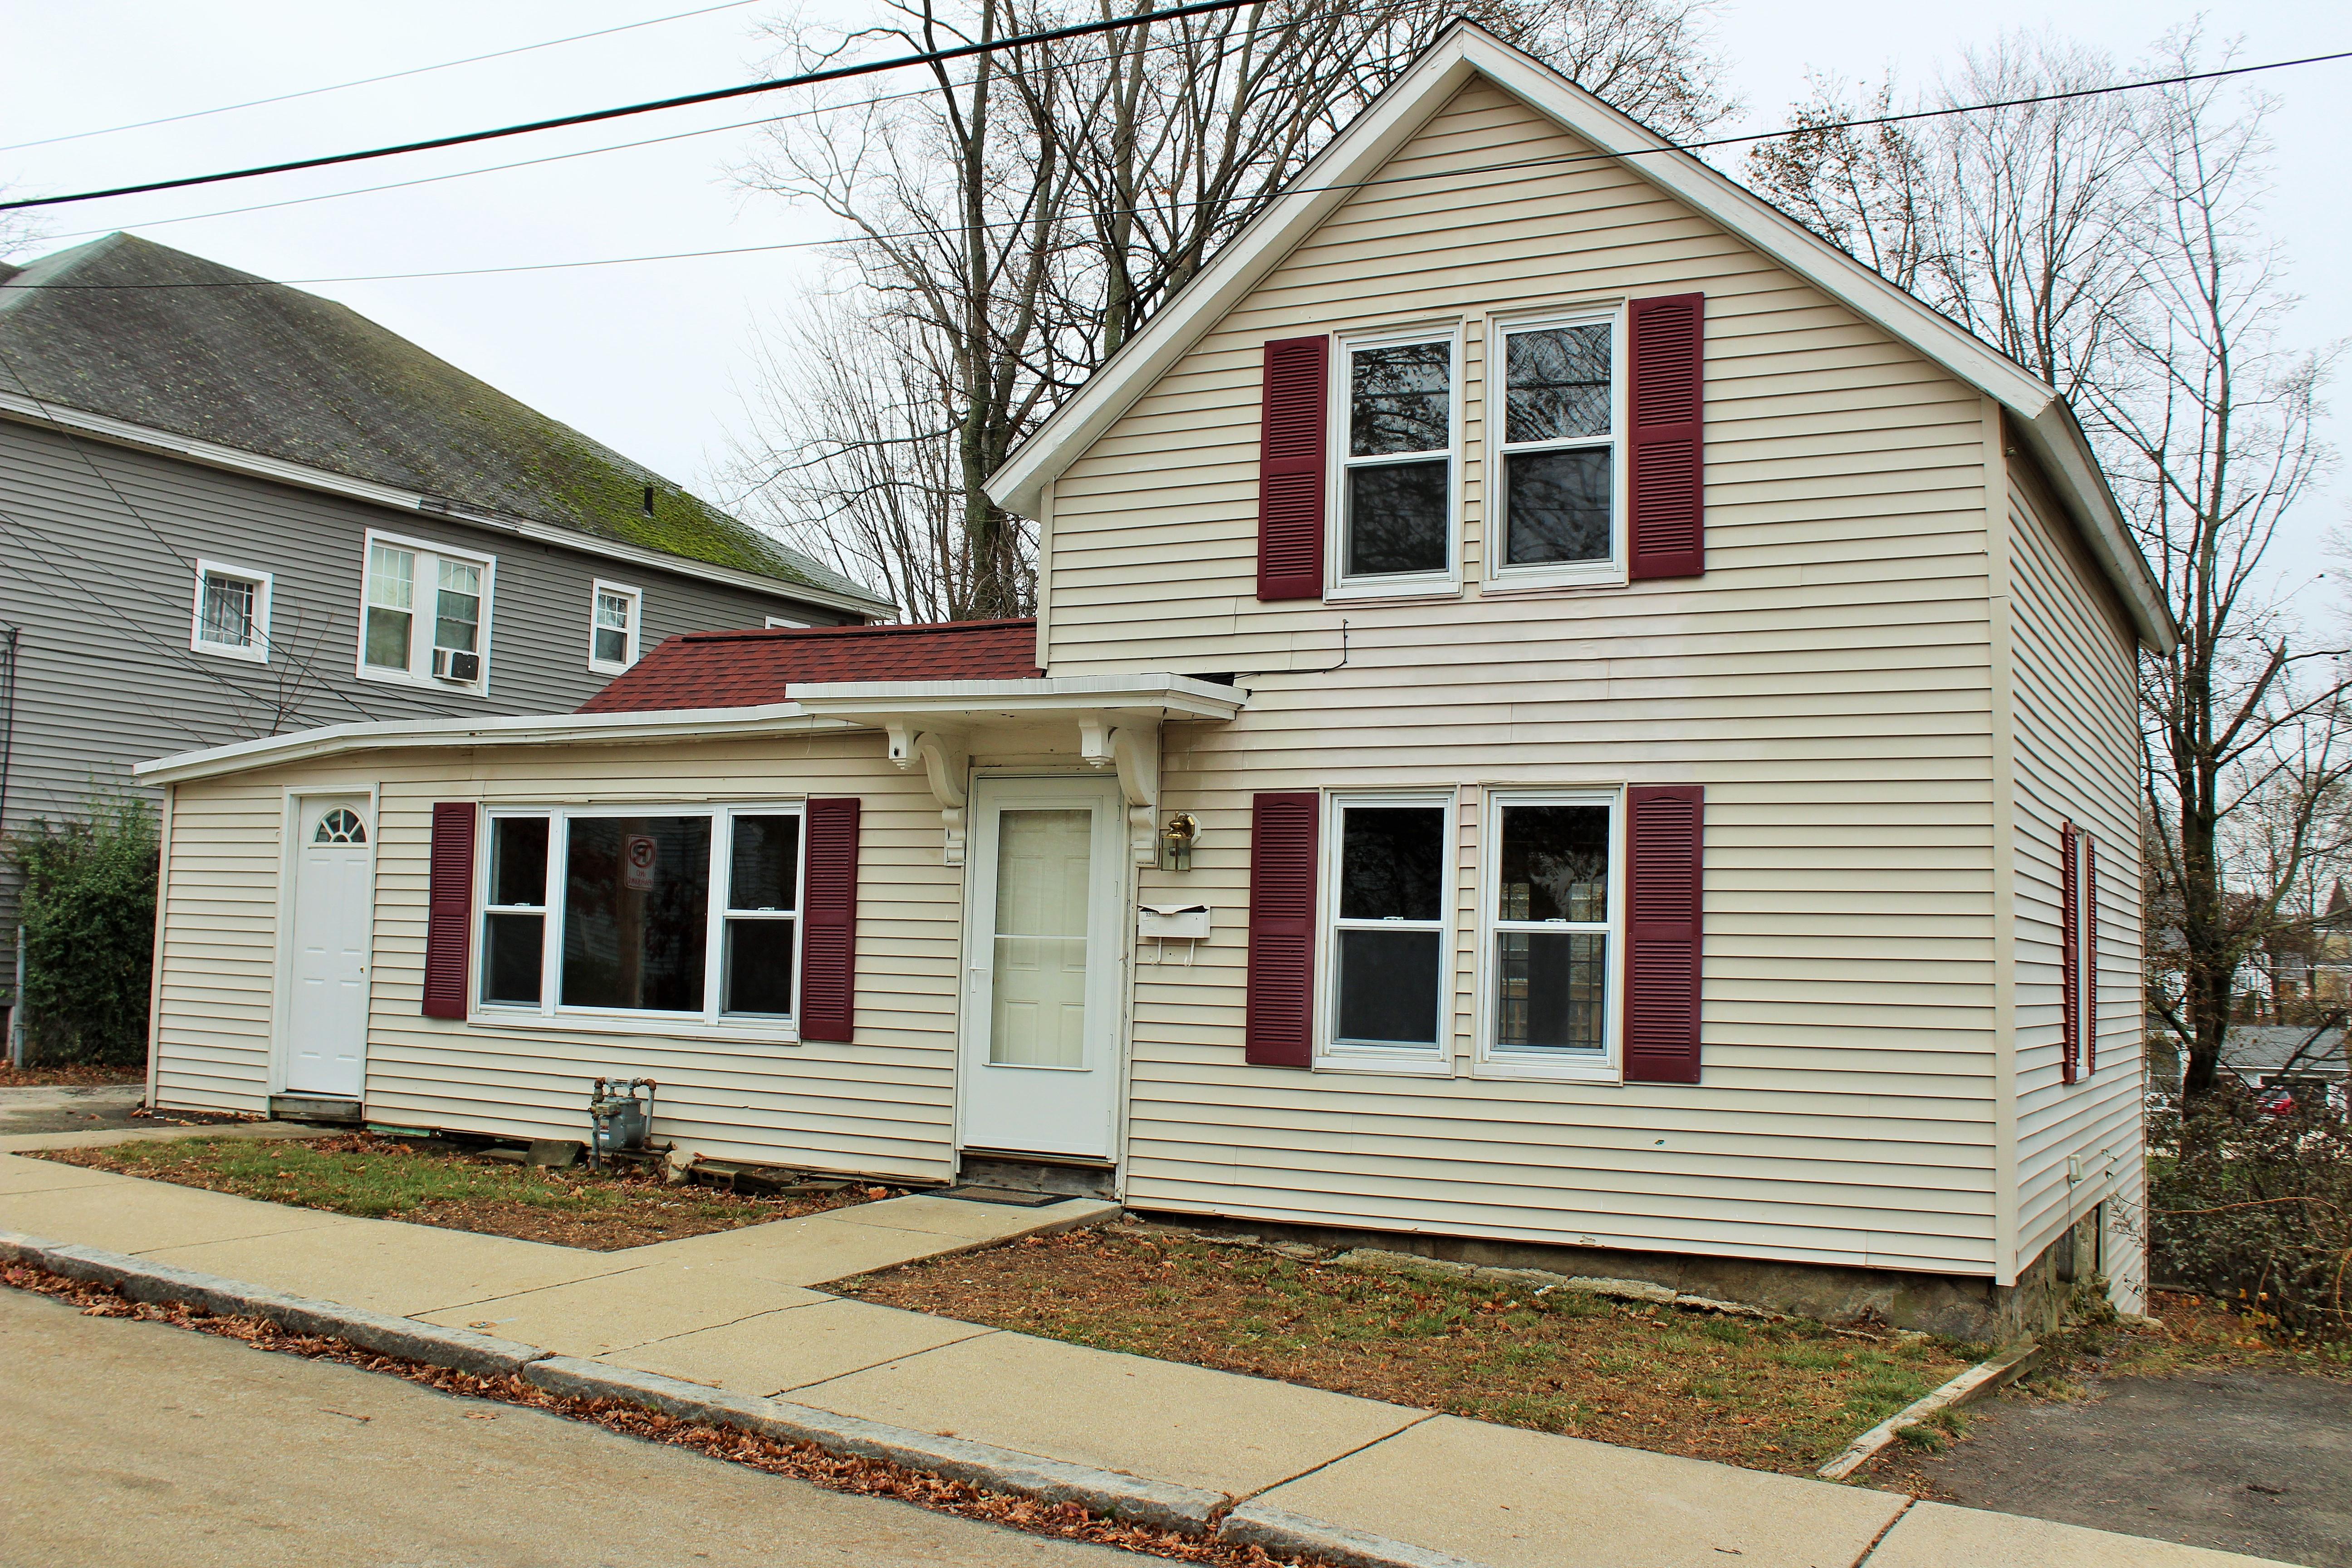 Home for sale: 32 Norton Street, Nashua, NH